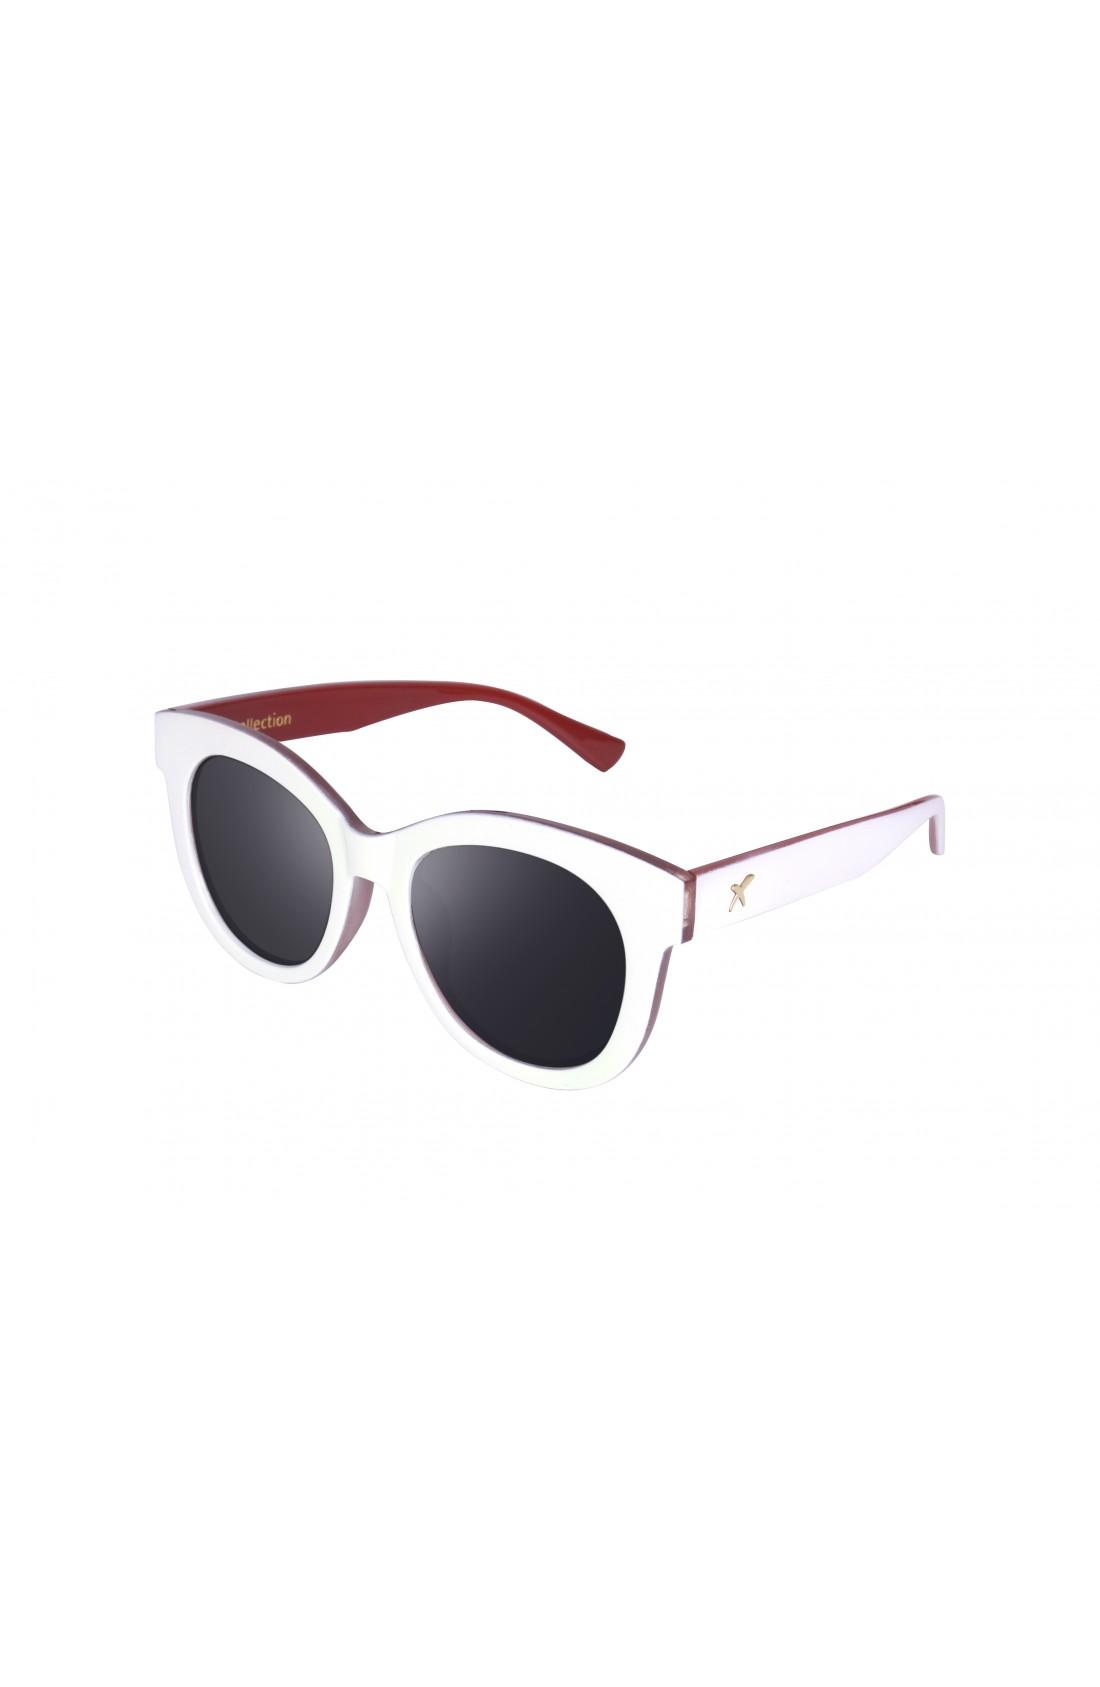 Sunglasses Style P01107_3